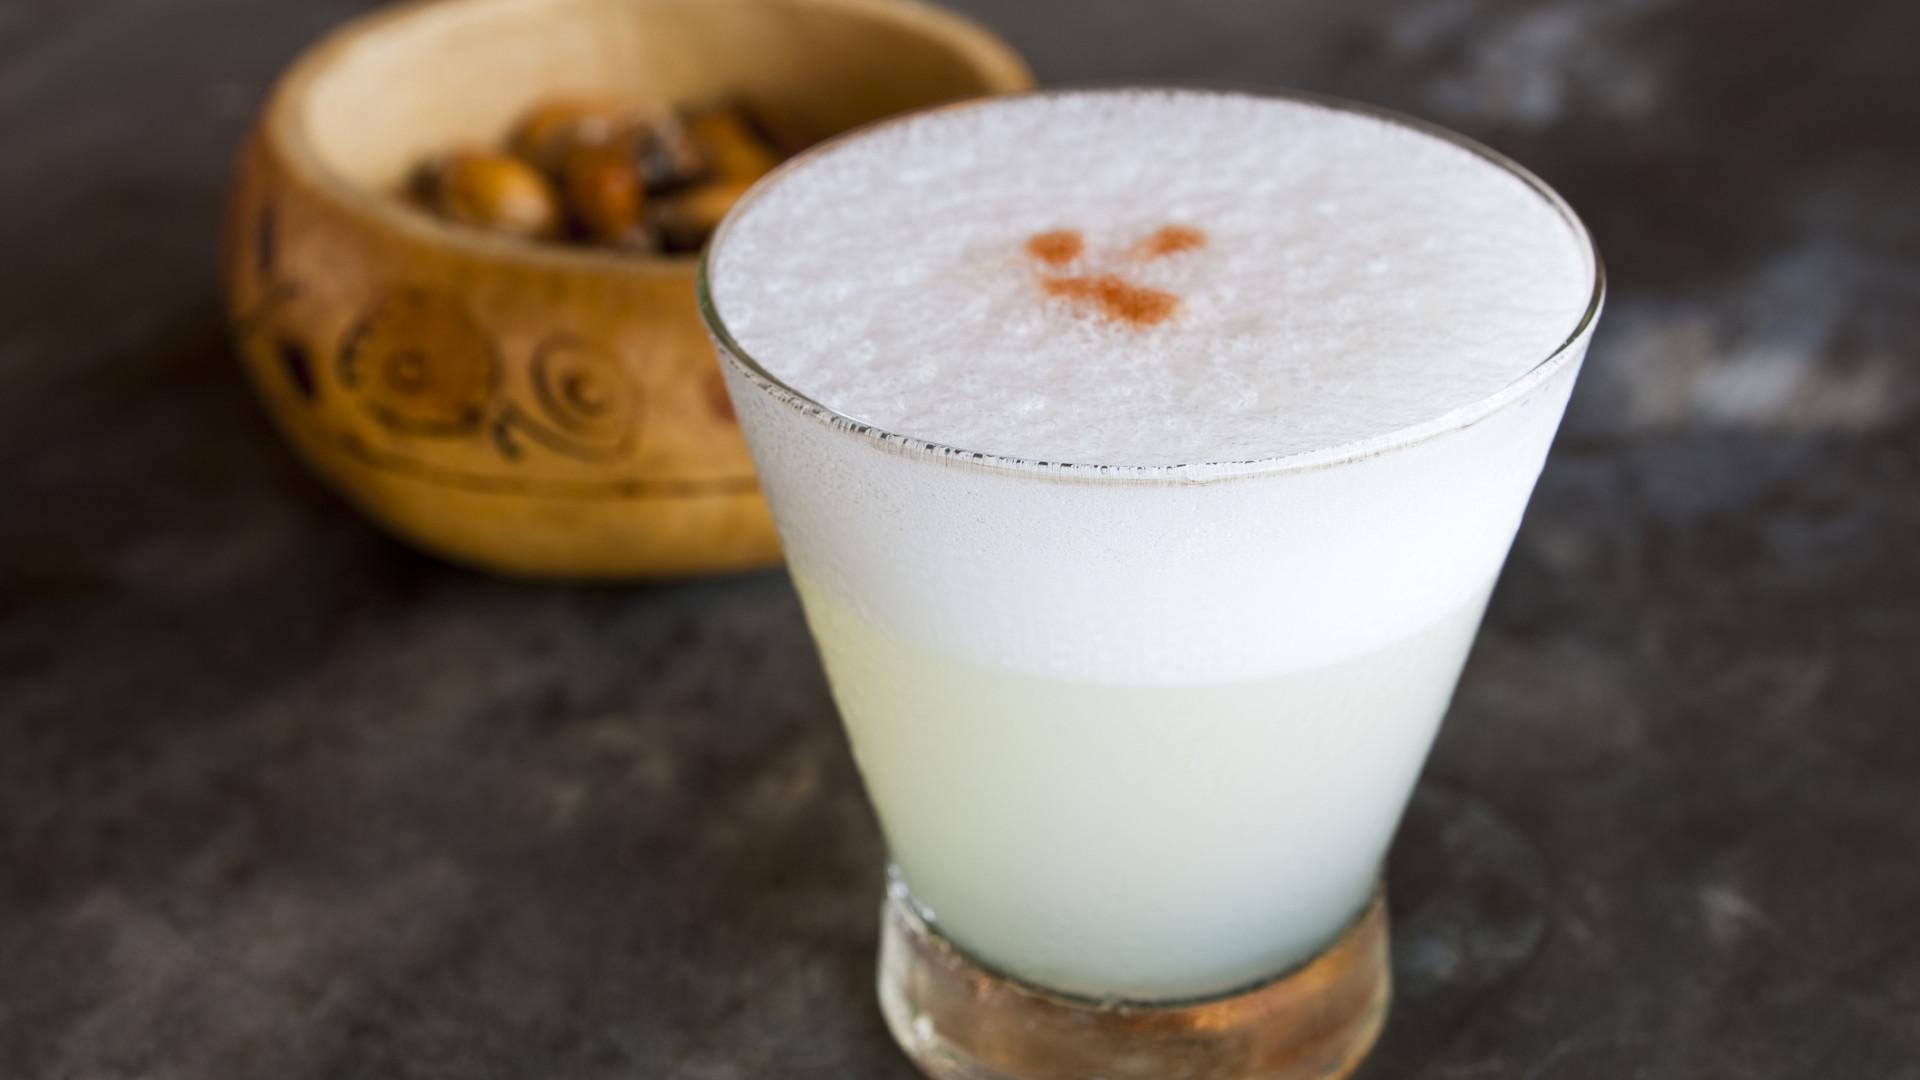 Peru's pisco sour